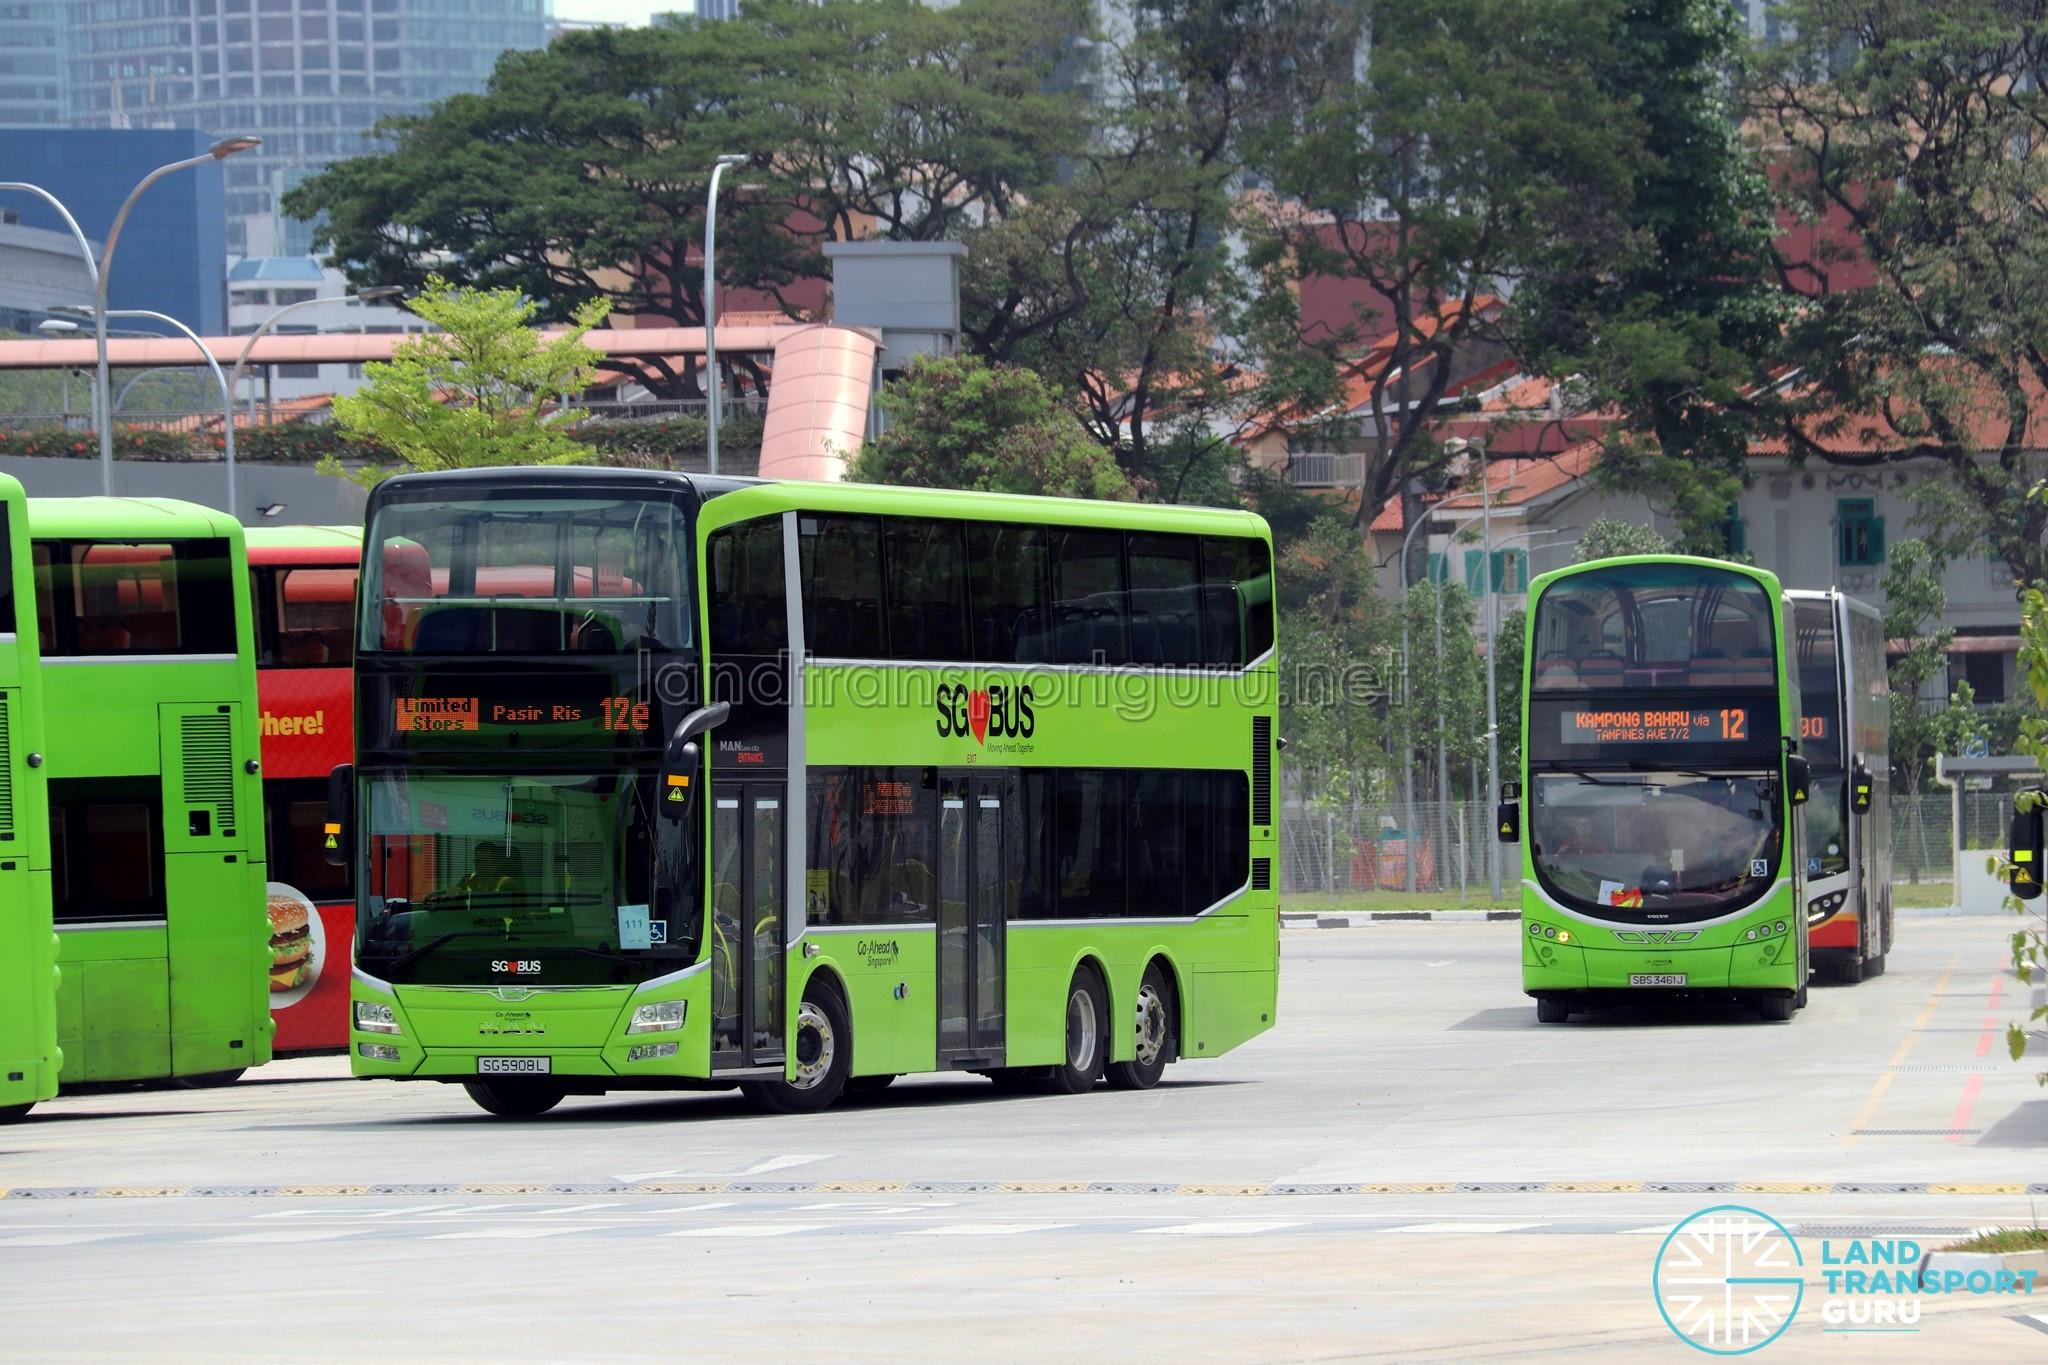 Service 12e & Service 12 at Kampong Bahru Bus Terminal